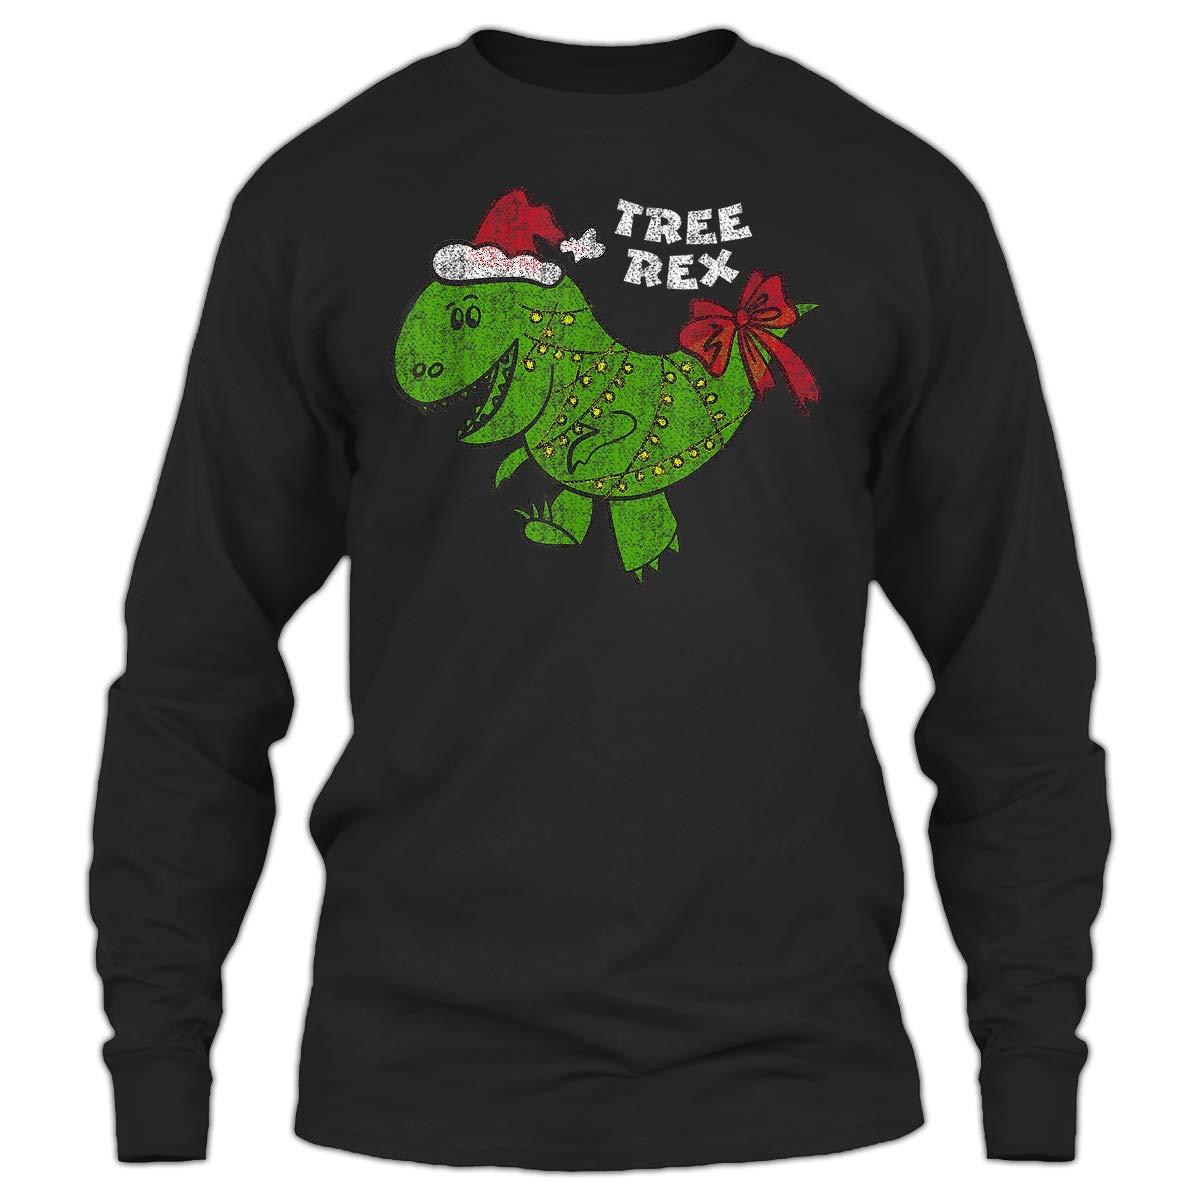 Sunwind Christmas Tree Rex Dinosaur For Men Women Black And Navy Shirts